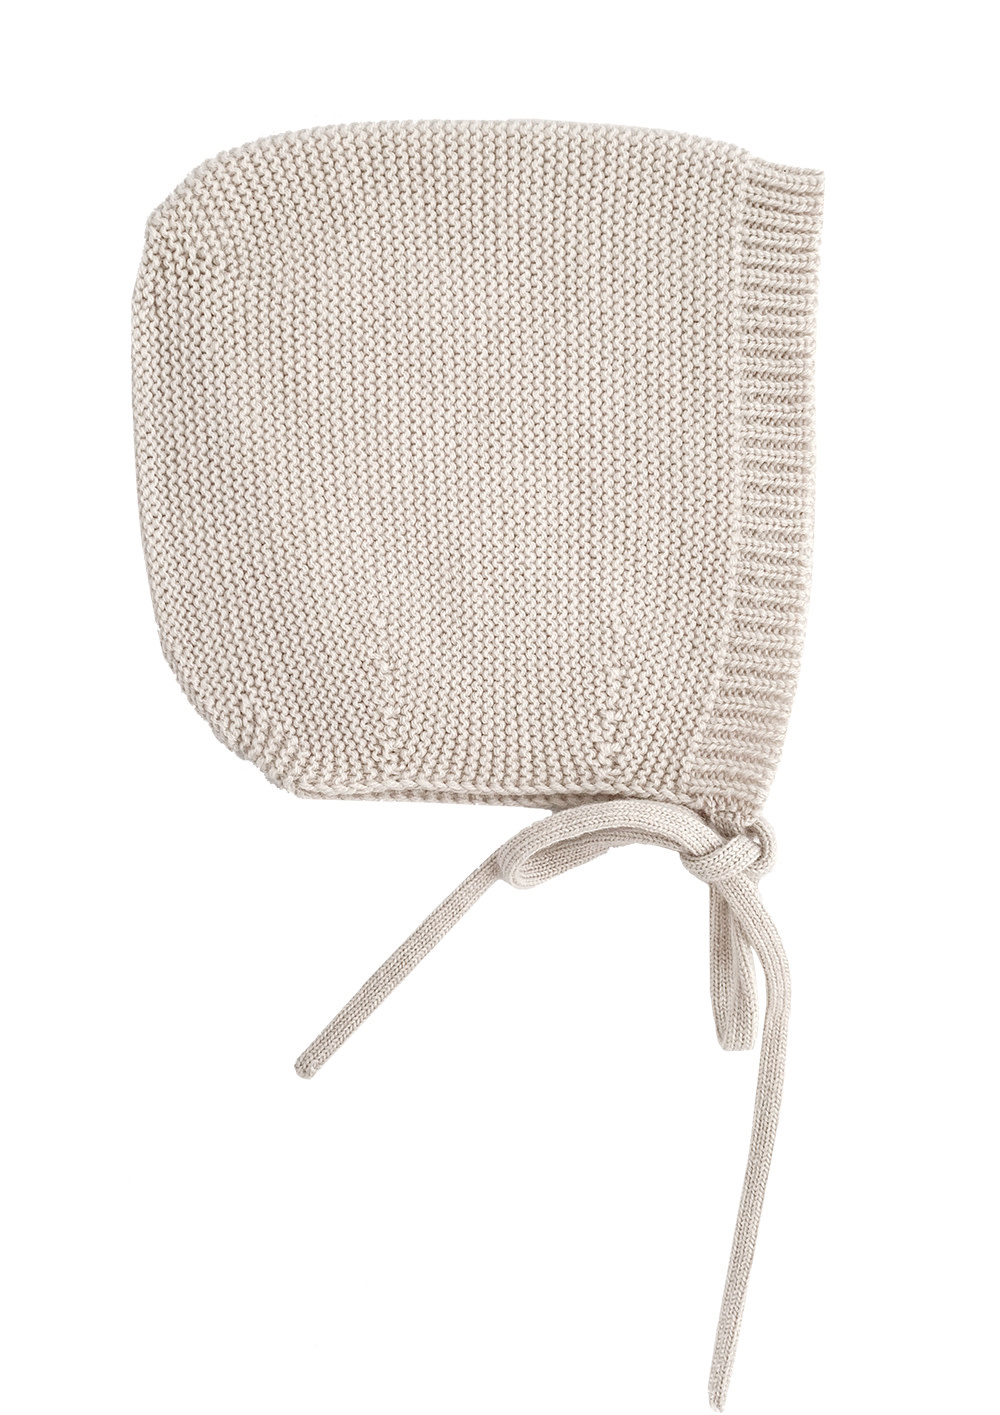 Bonnet dolly off-white-4